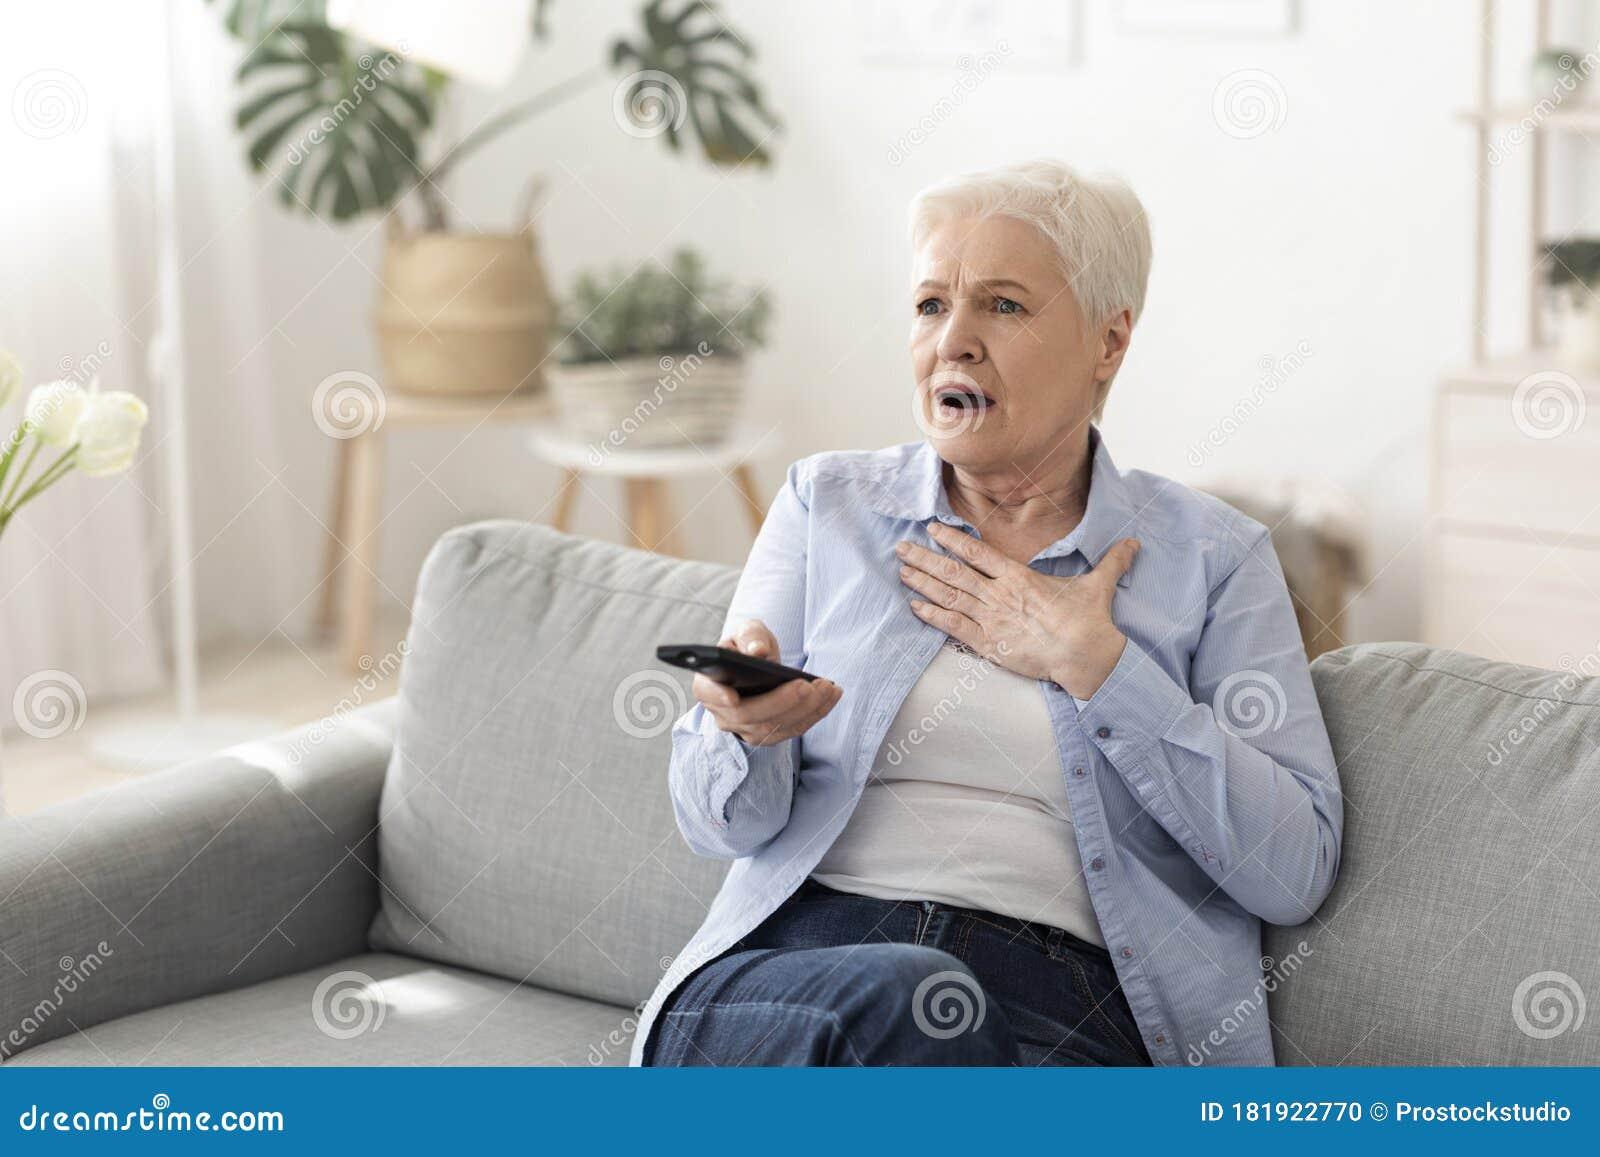 Seniors Enjoying Television Stock Photo - Download Image